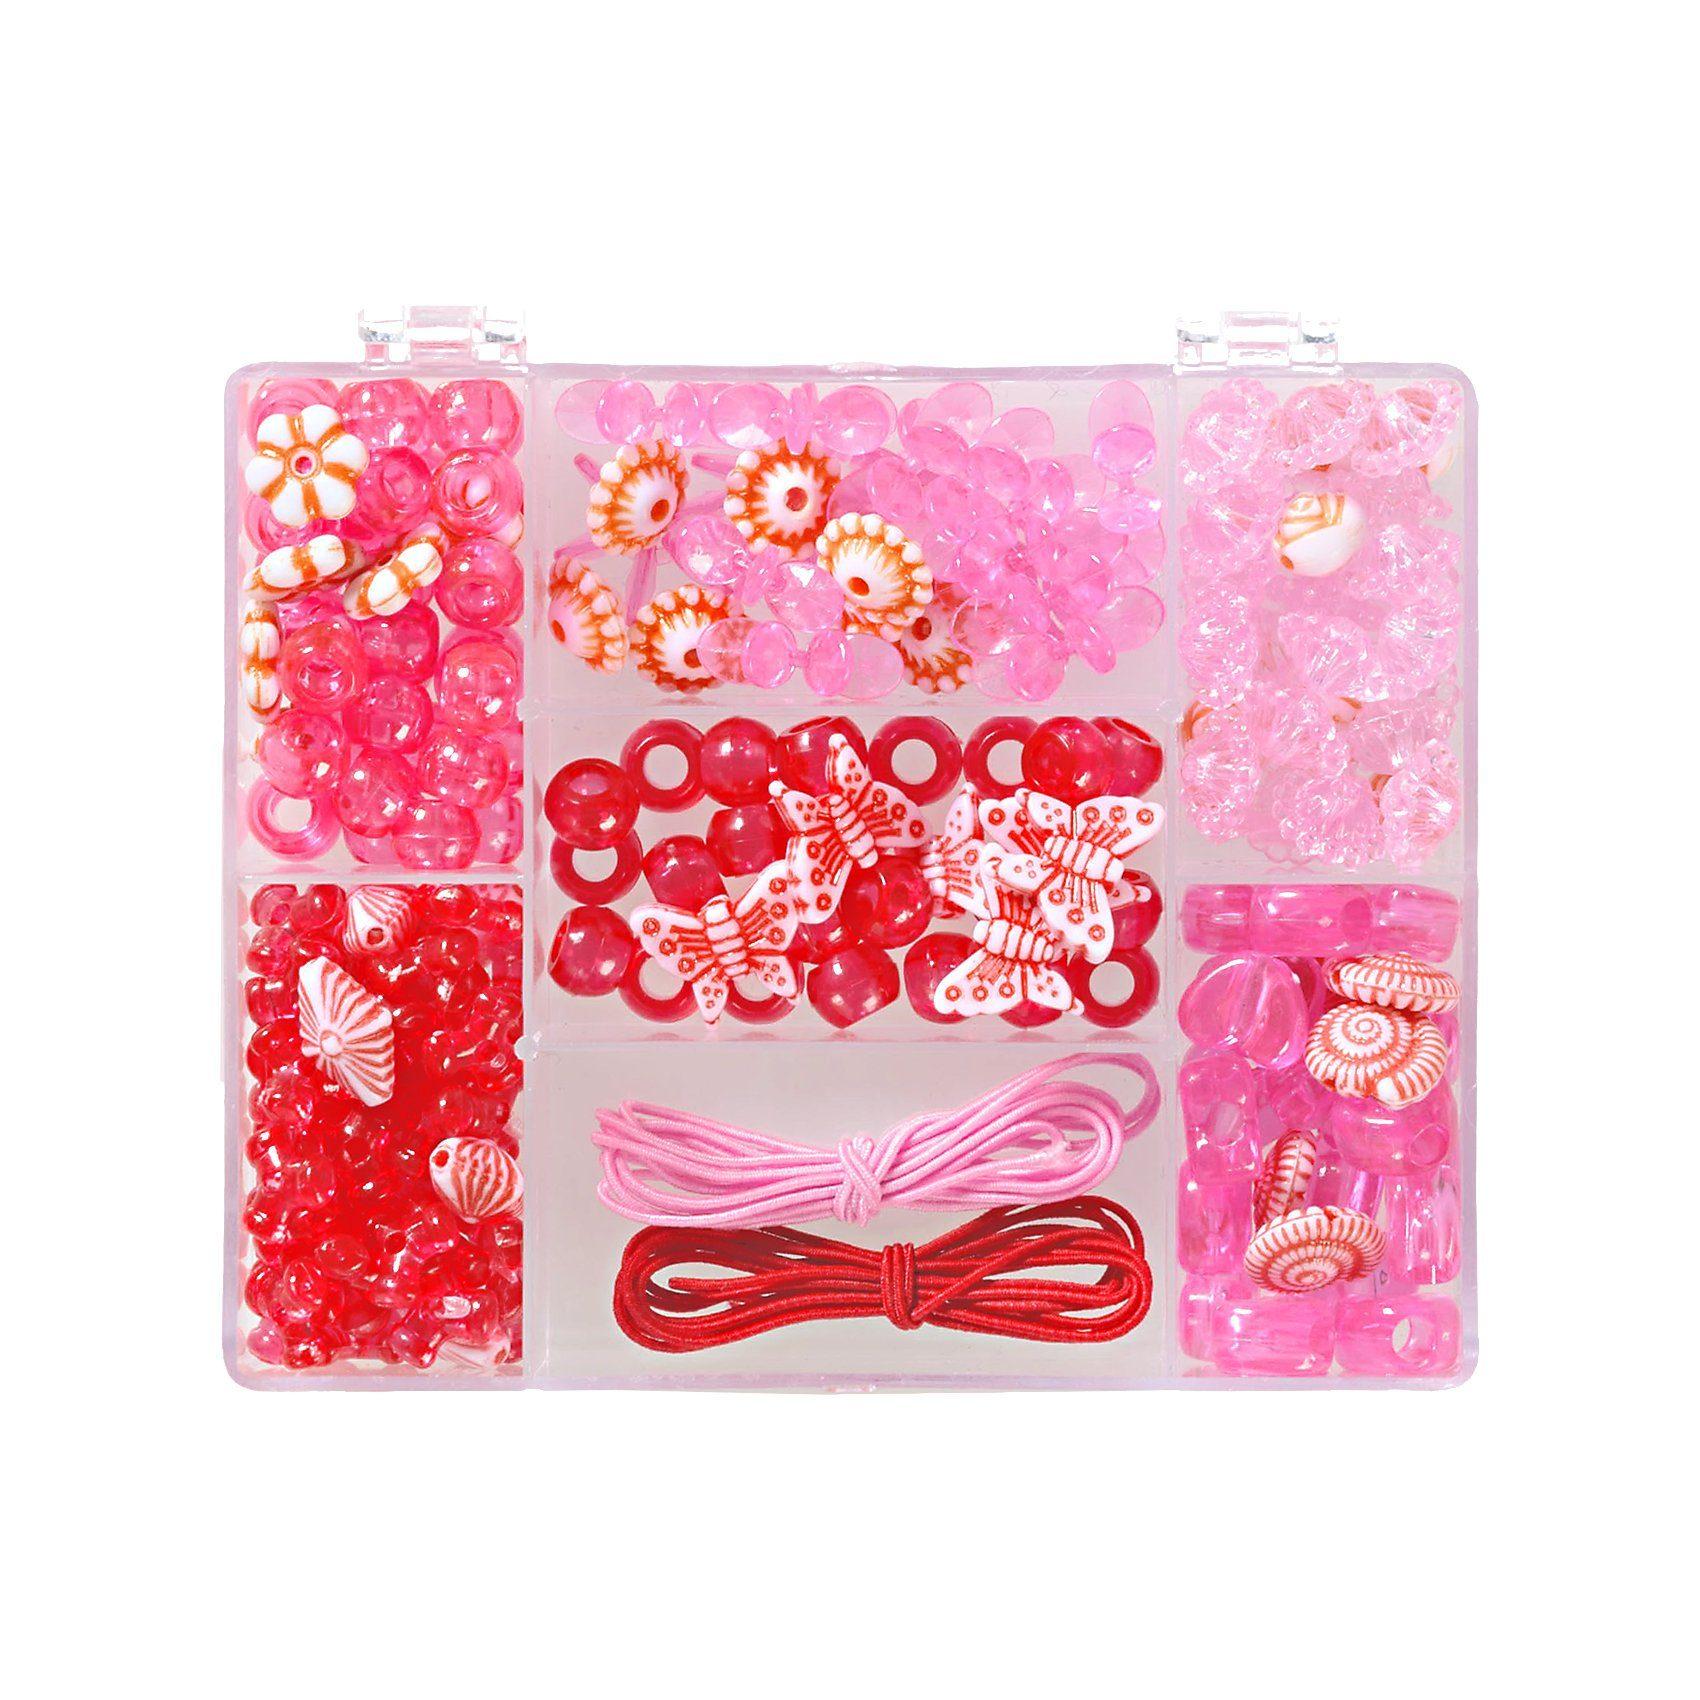 prohobb Perlenbox Rot/Pink, inkl. Stretchgummi